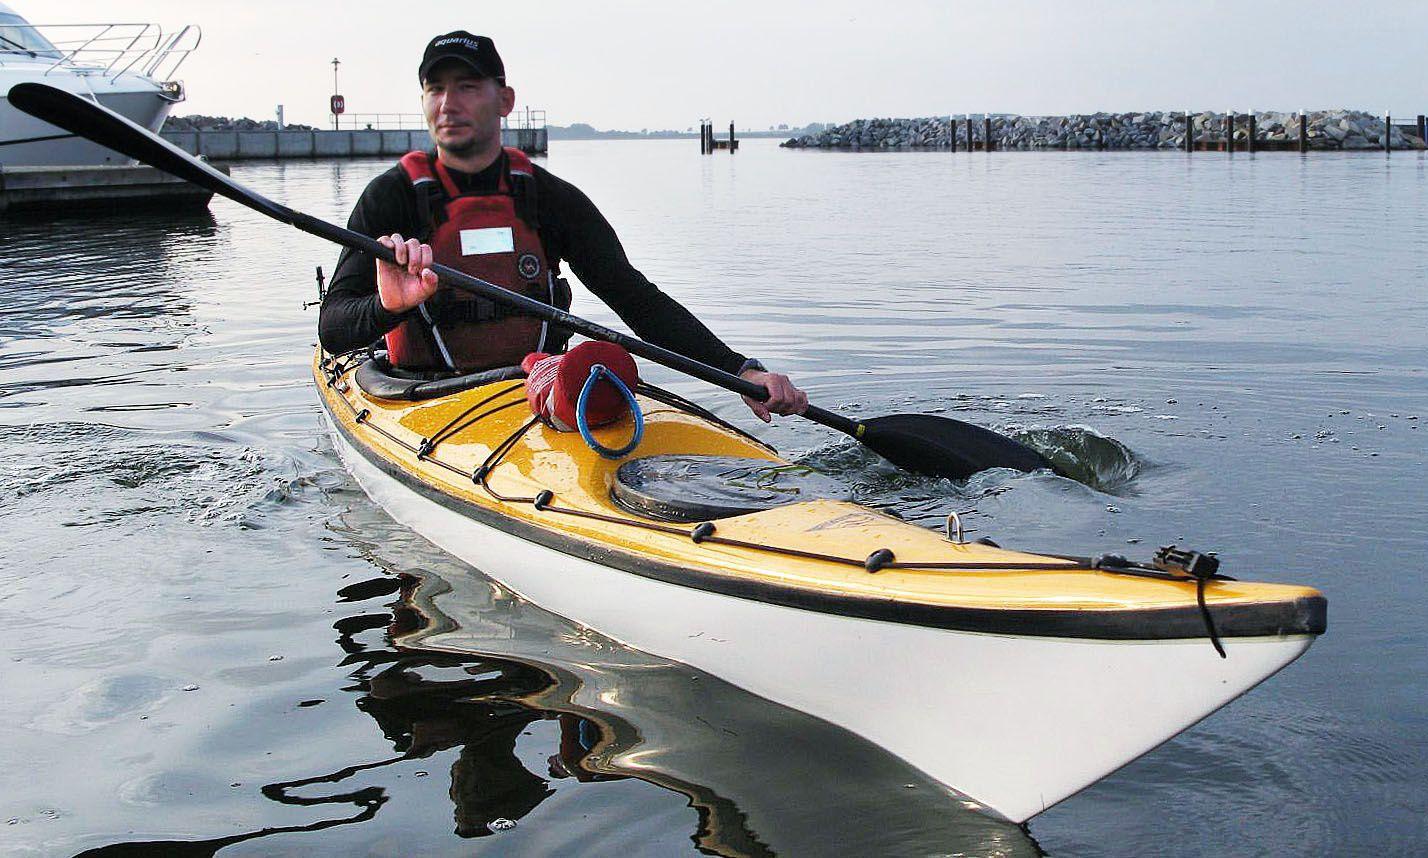 Rigid kayak / sea / expedition / solo - CRUISER 530 - Aquarius